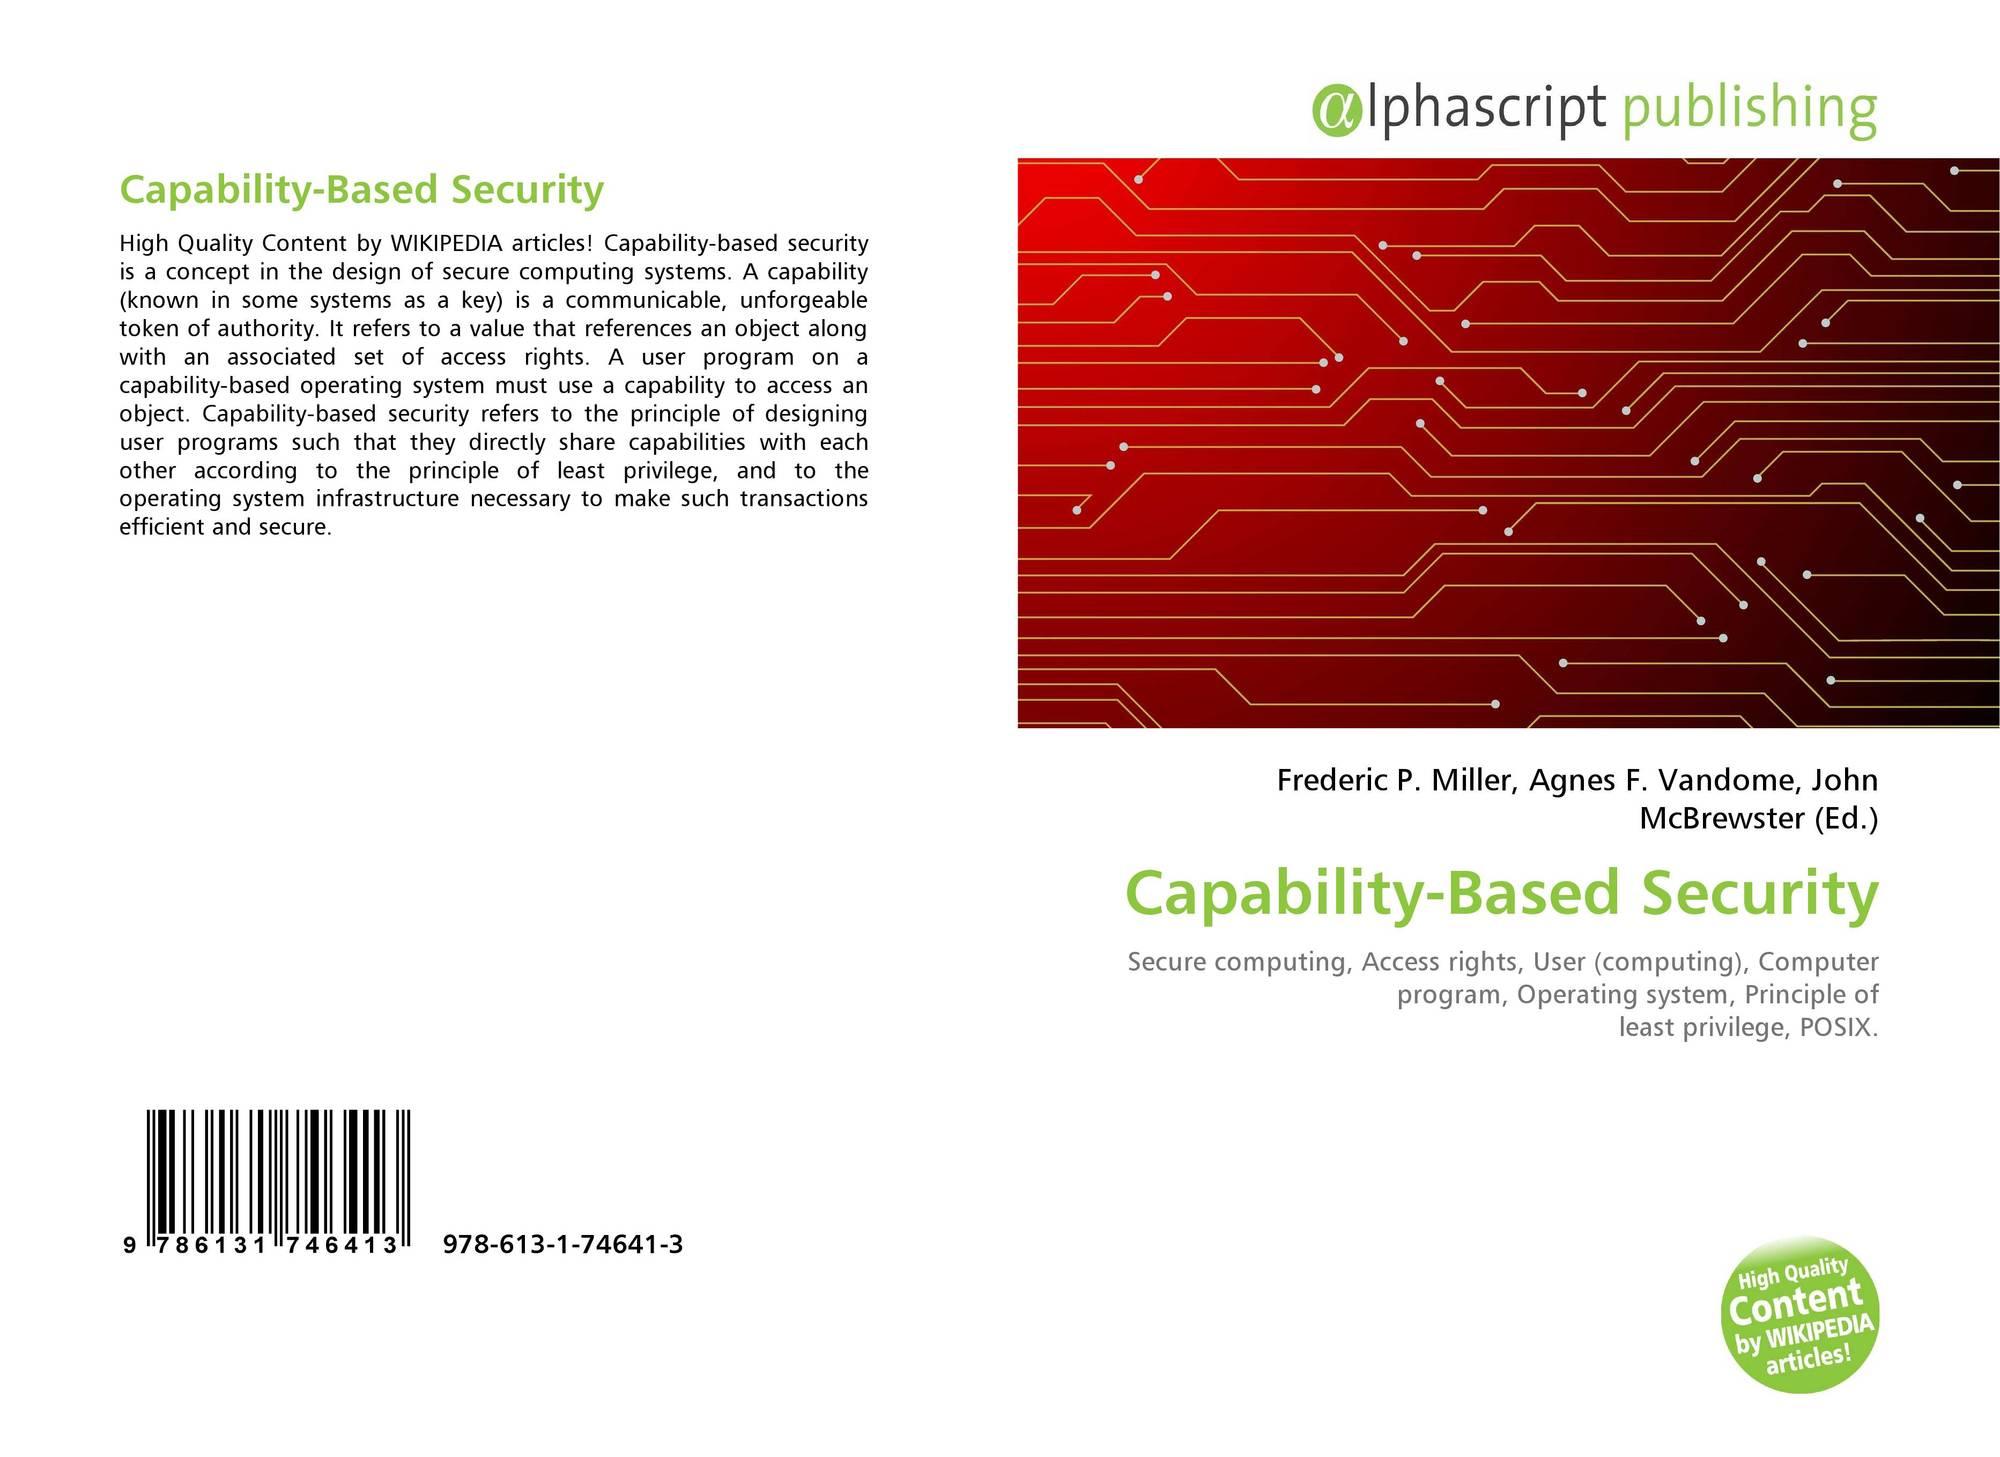 Capability Based Security 978 613 1 74641 3 6131746419 9786131746413